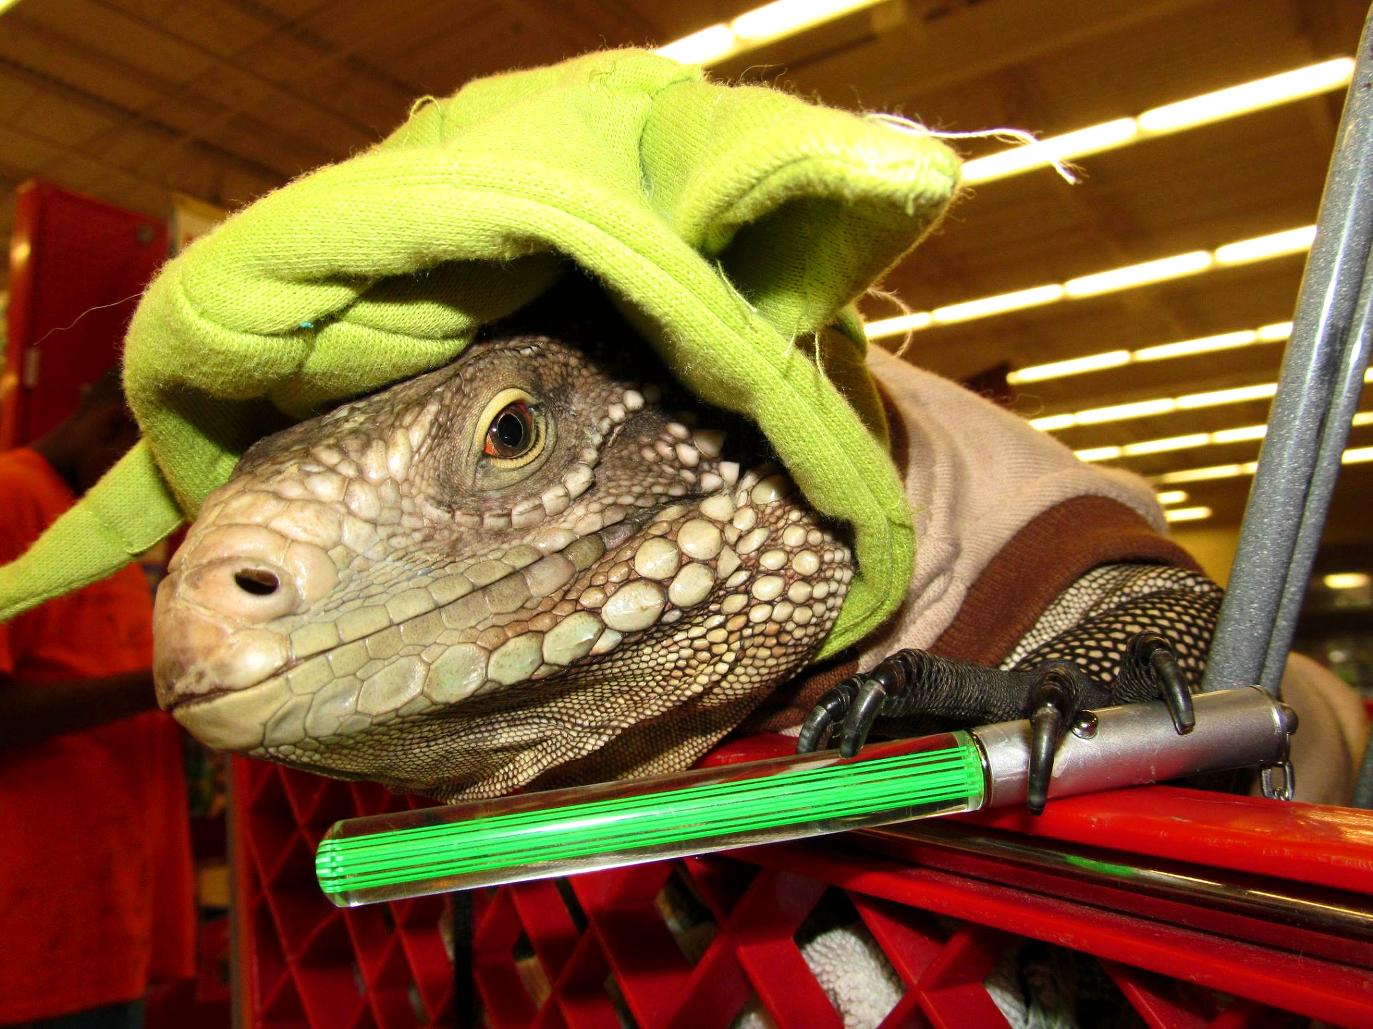 iguana in yoda costume